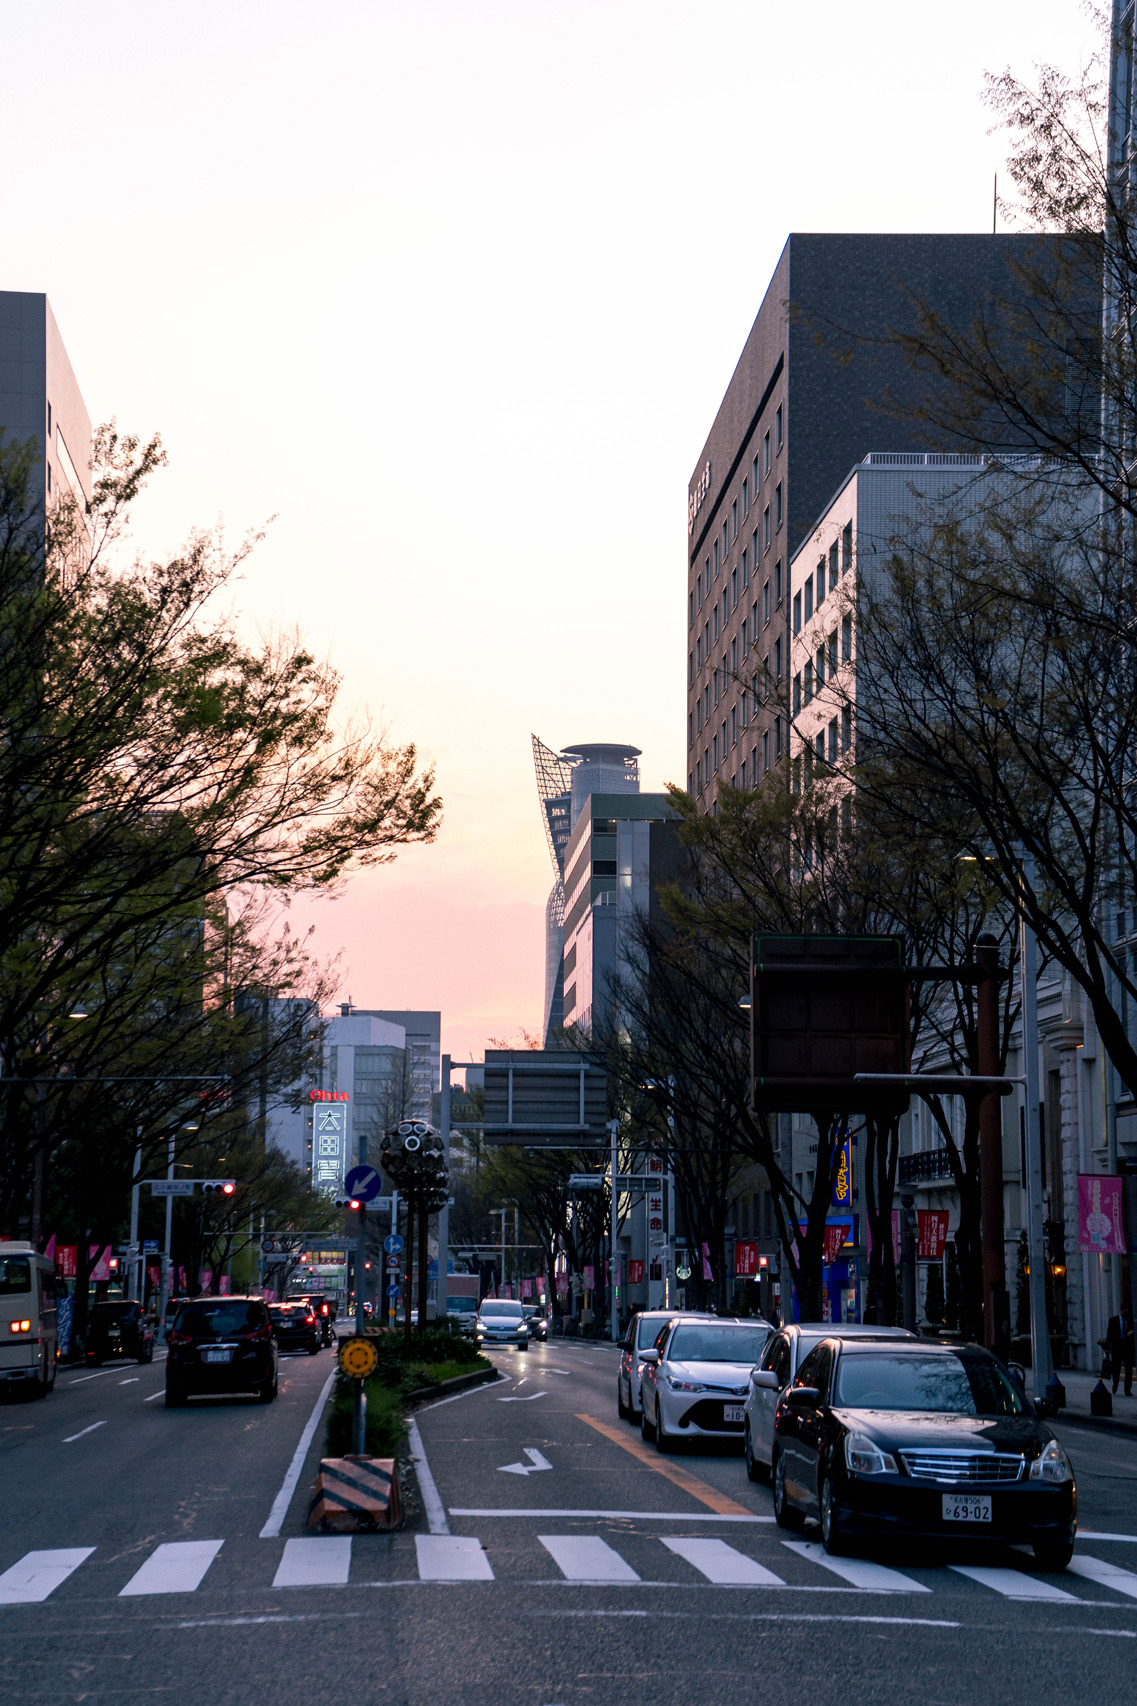 Nagoya at dusk